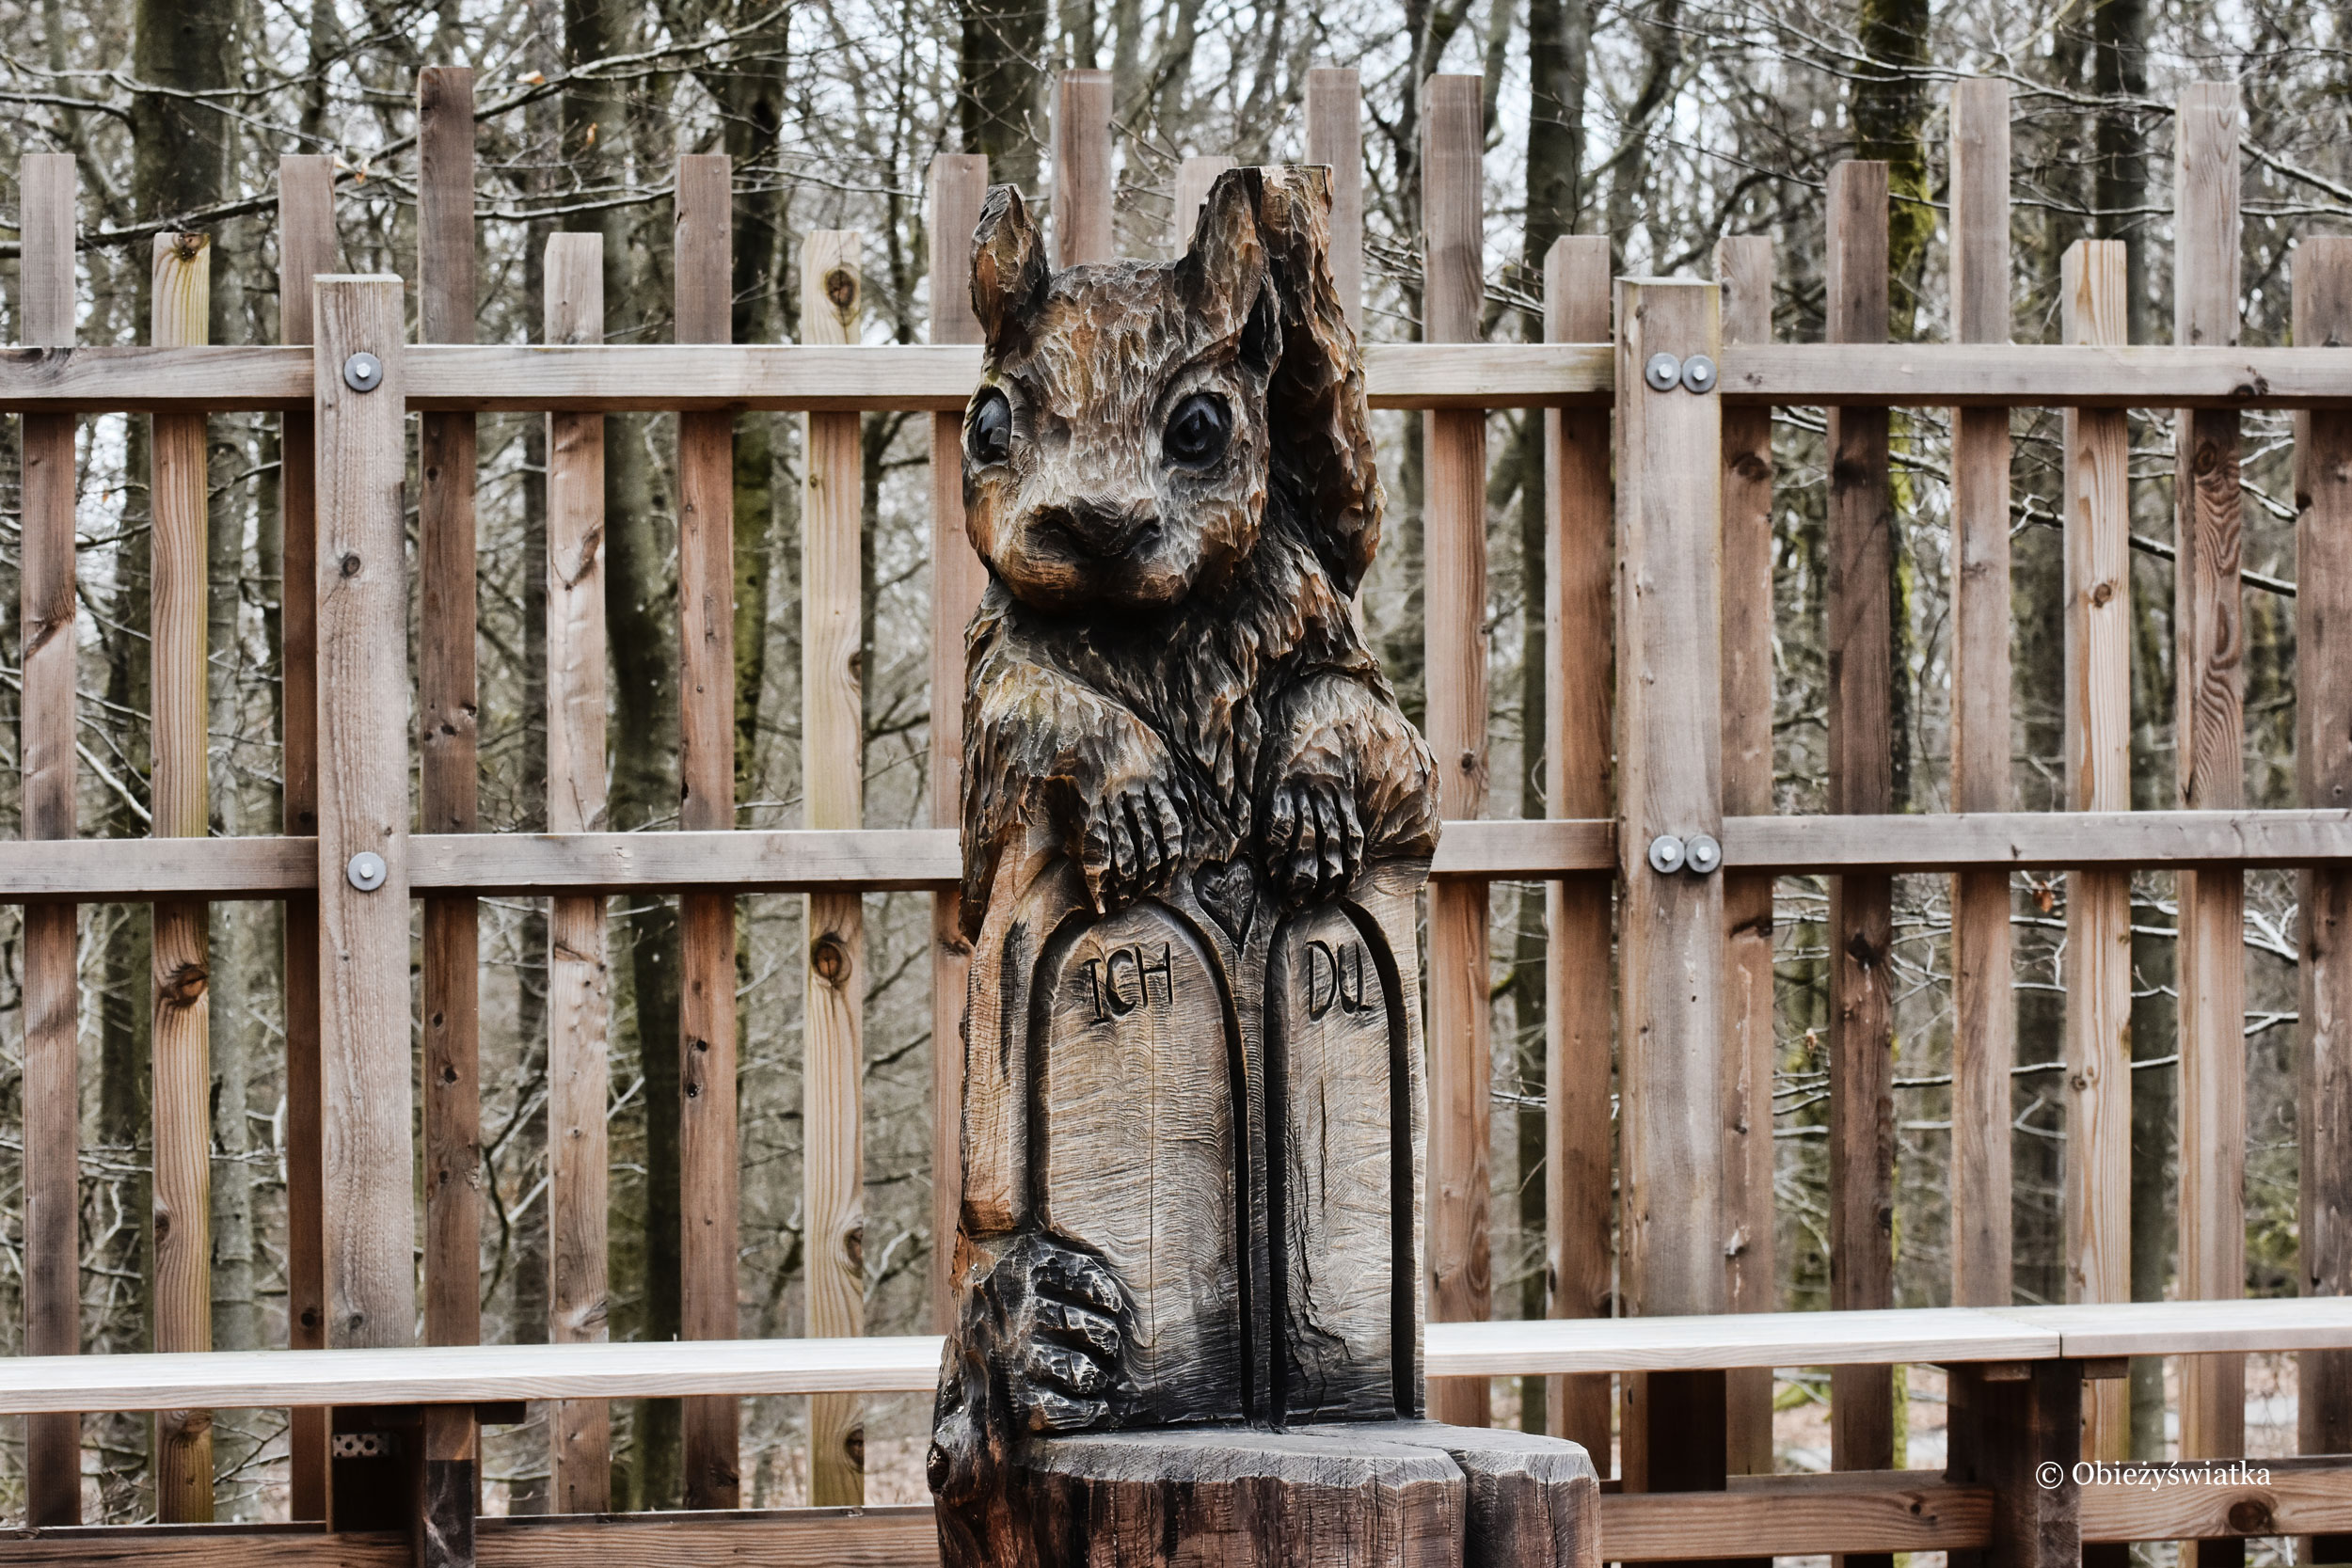 Wiewiórka - Baumwipfelpfad Saarschleife